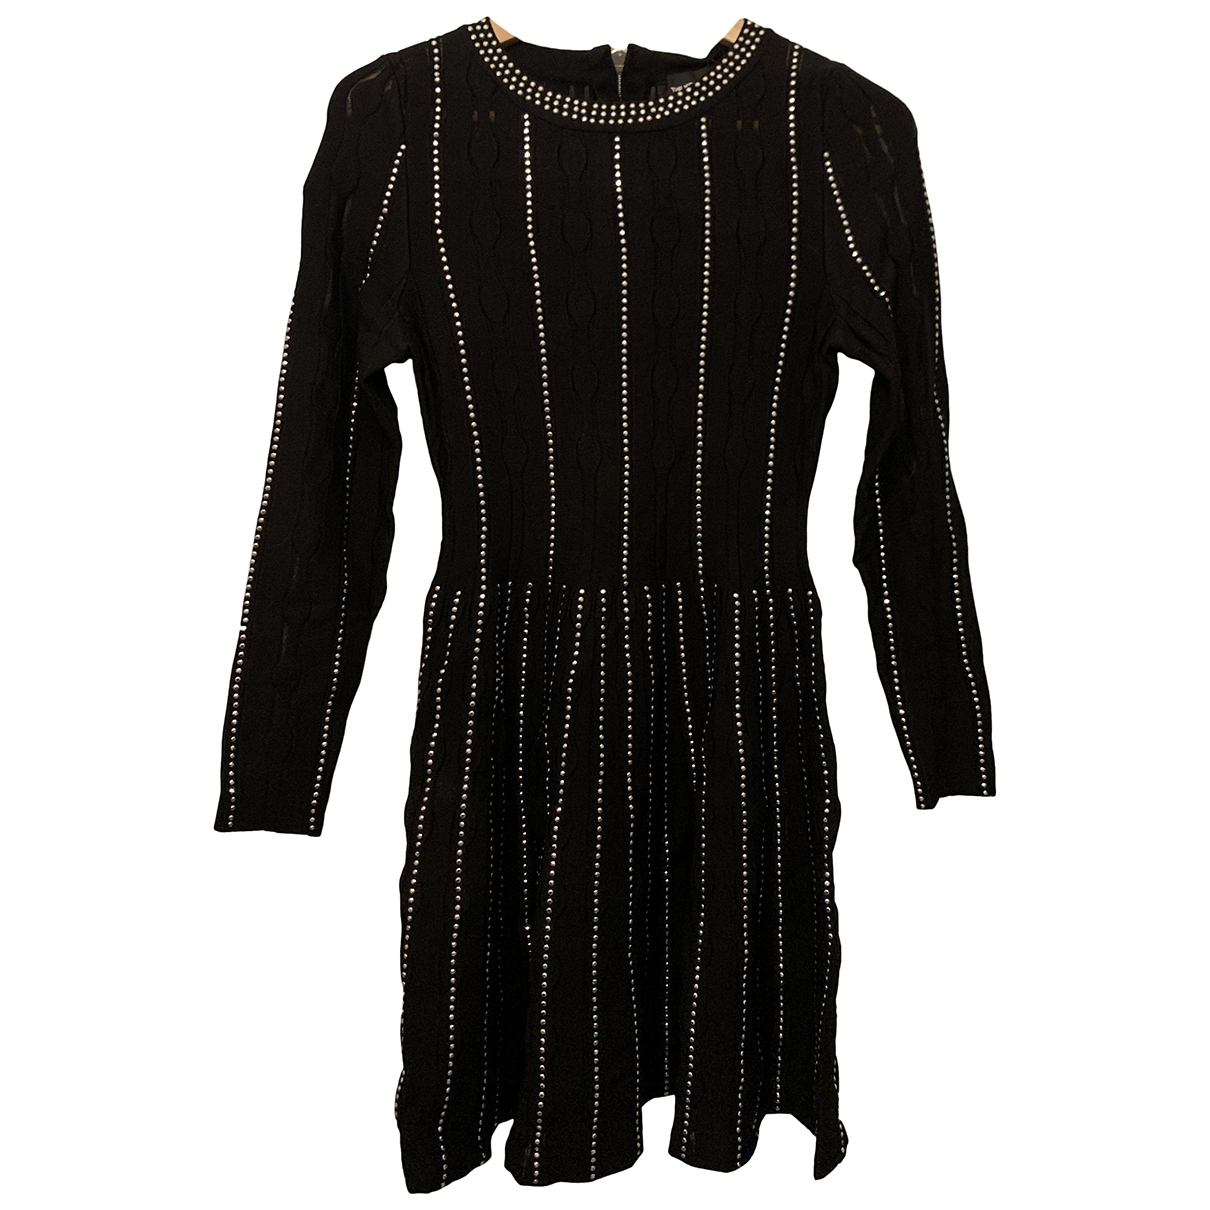 The Kooples \N Black dress for Women XS International